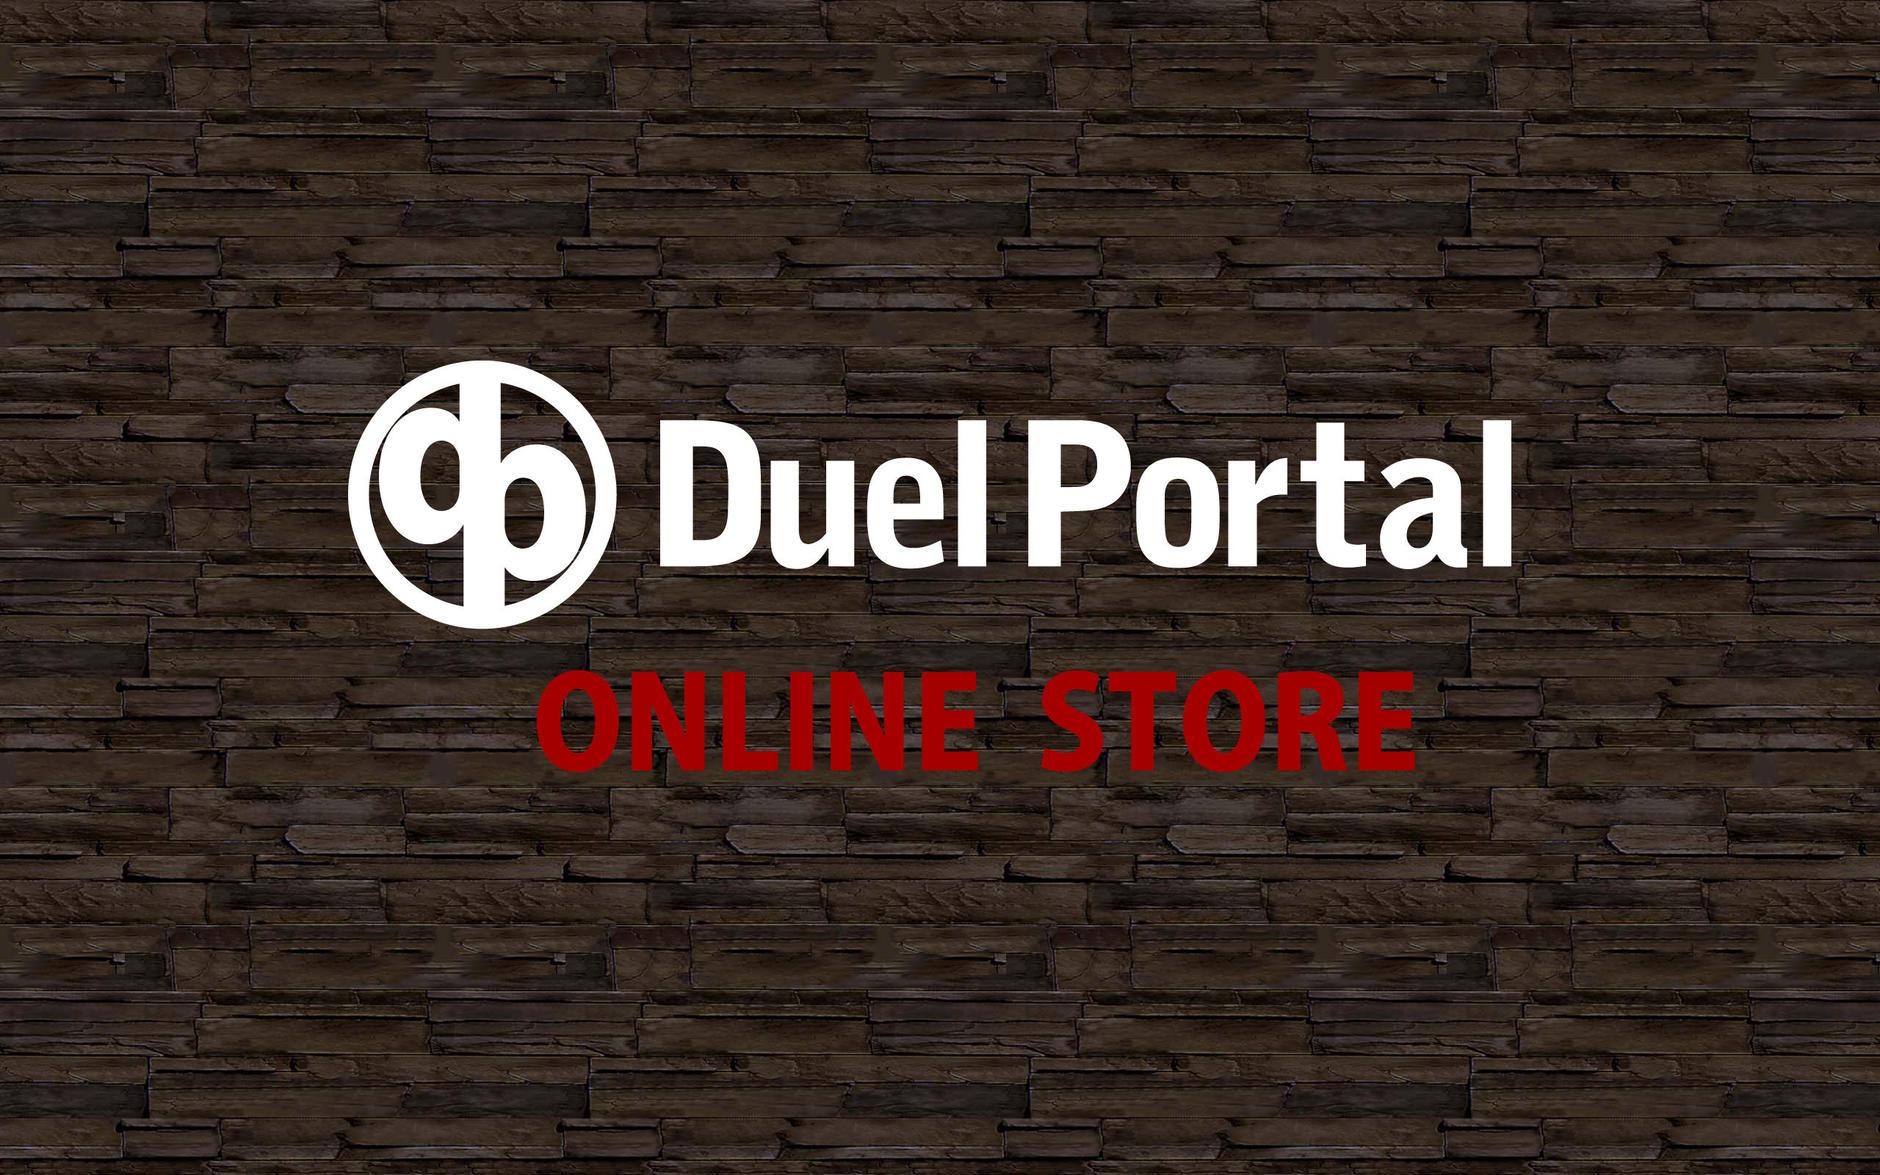 Duel Portal ONLINE STORE